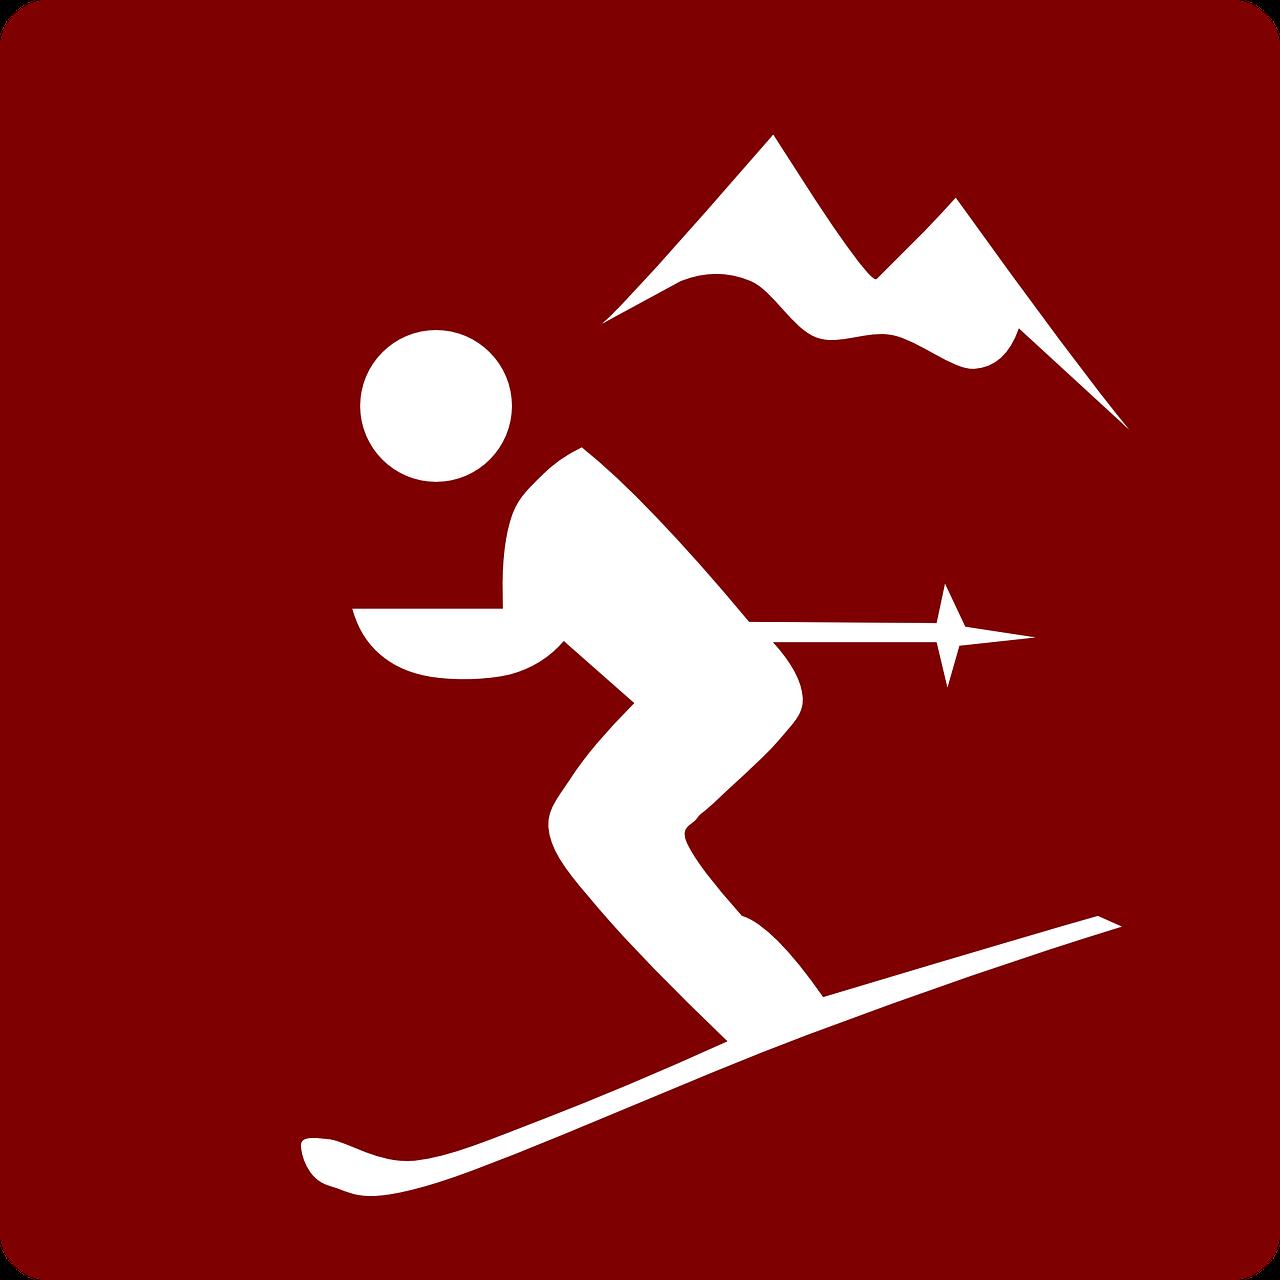 Carving ski clipart 20...